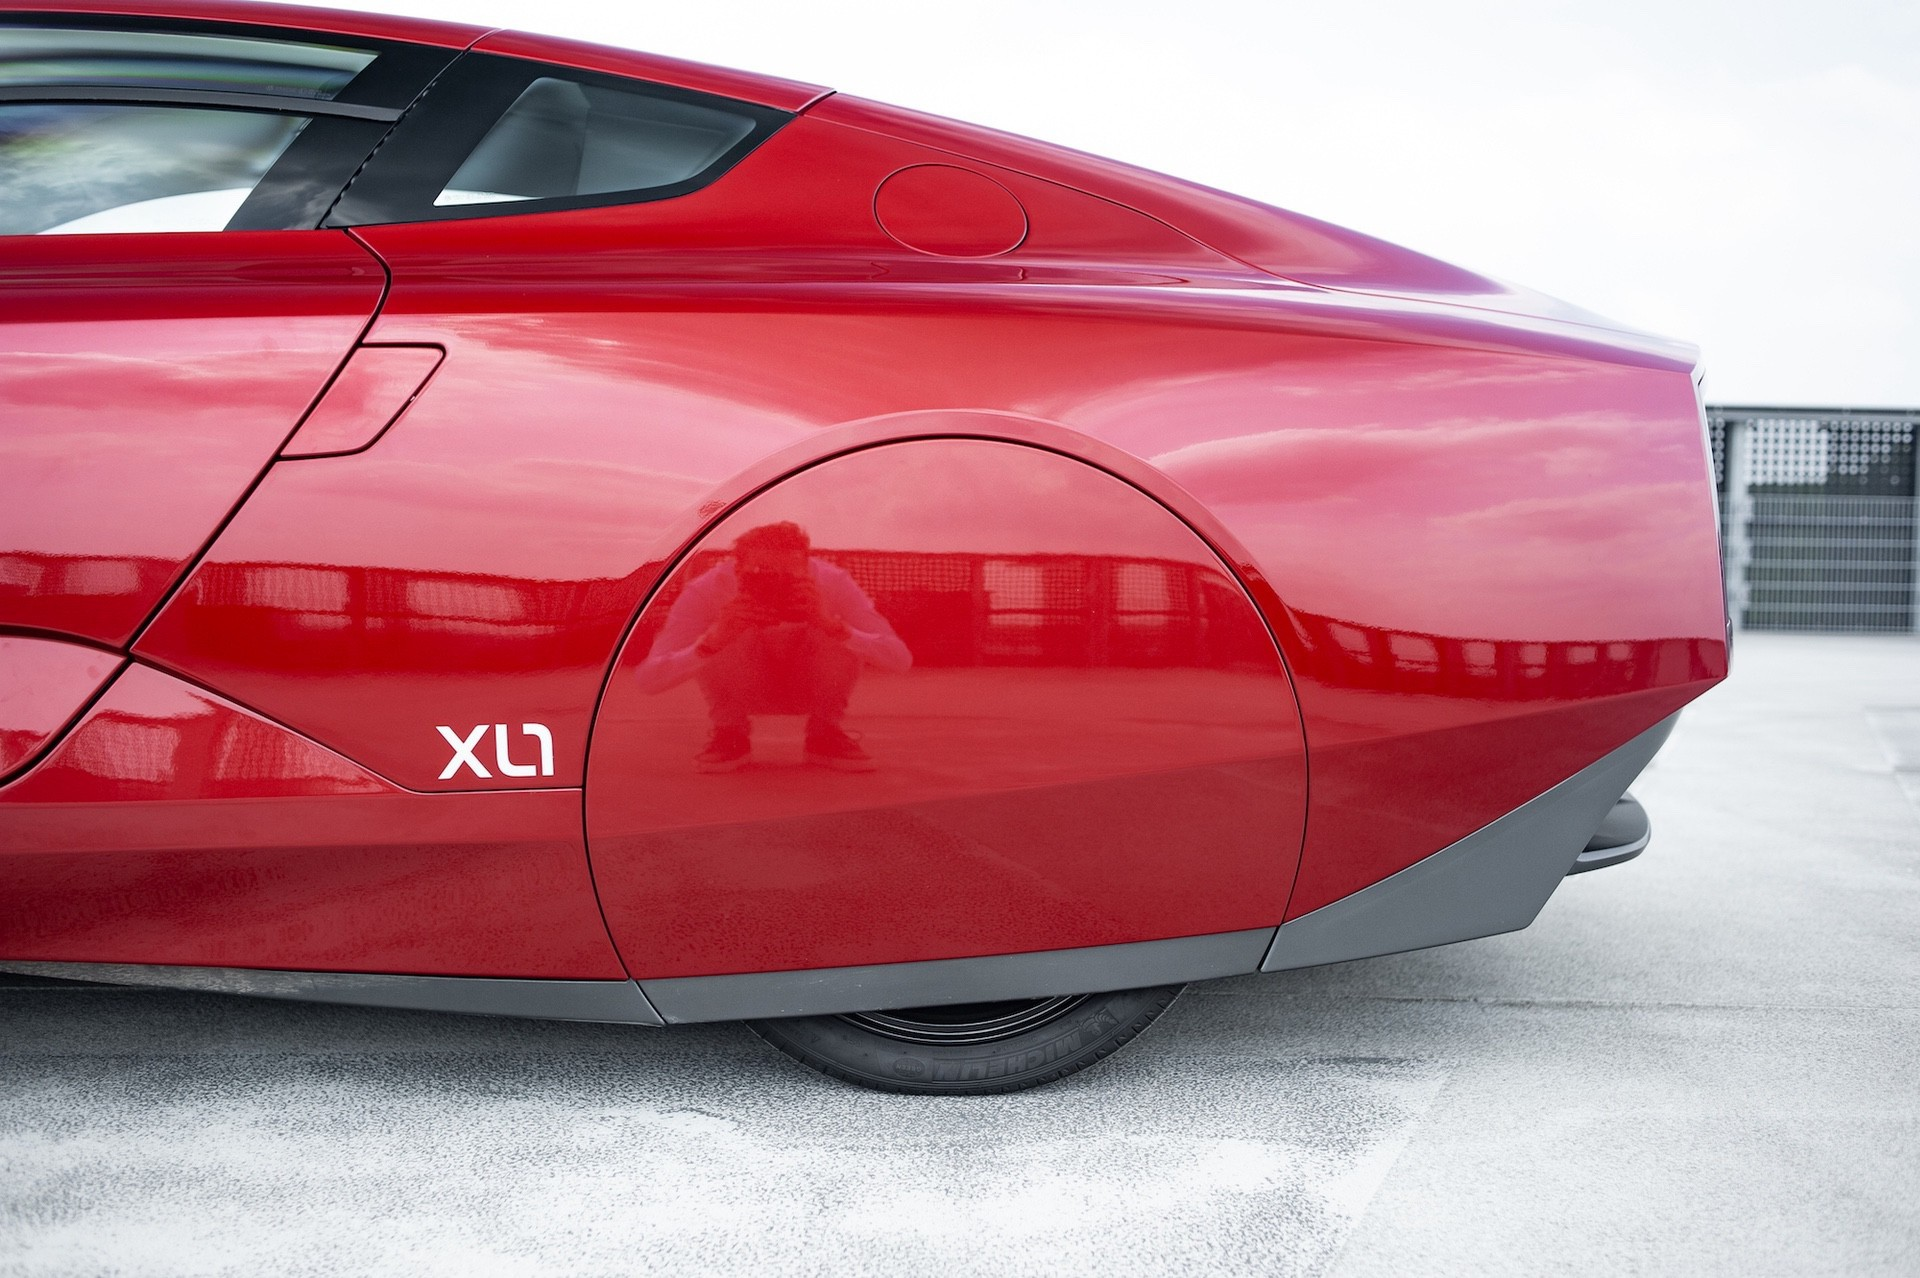 Volkswagen_XL1_sale-0076